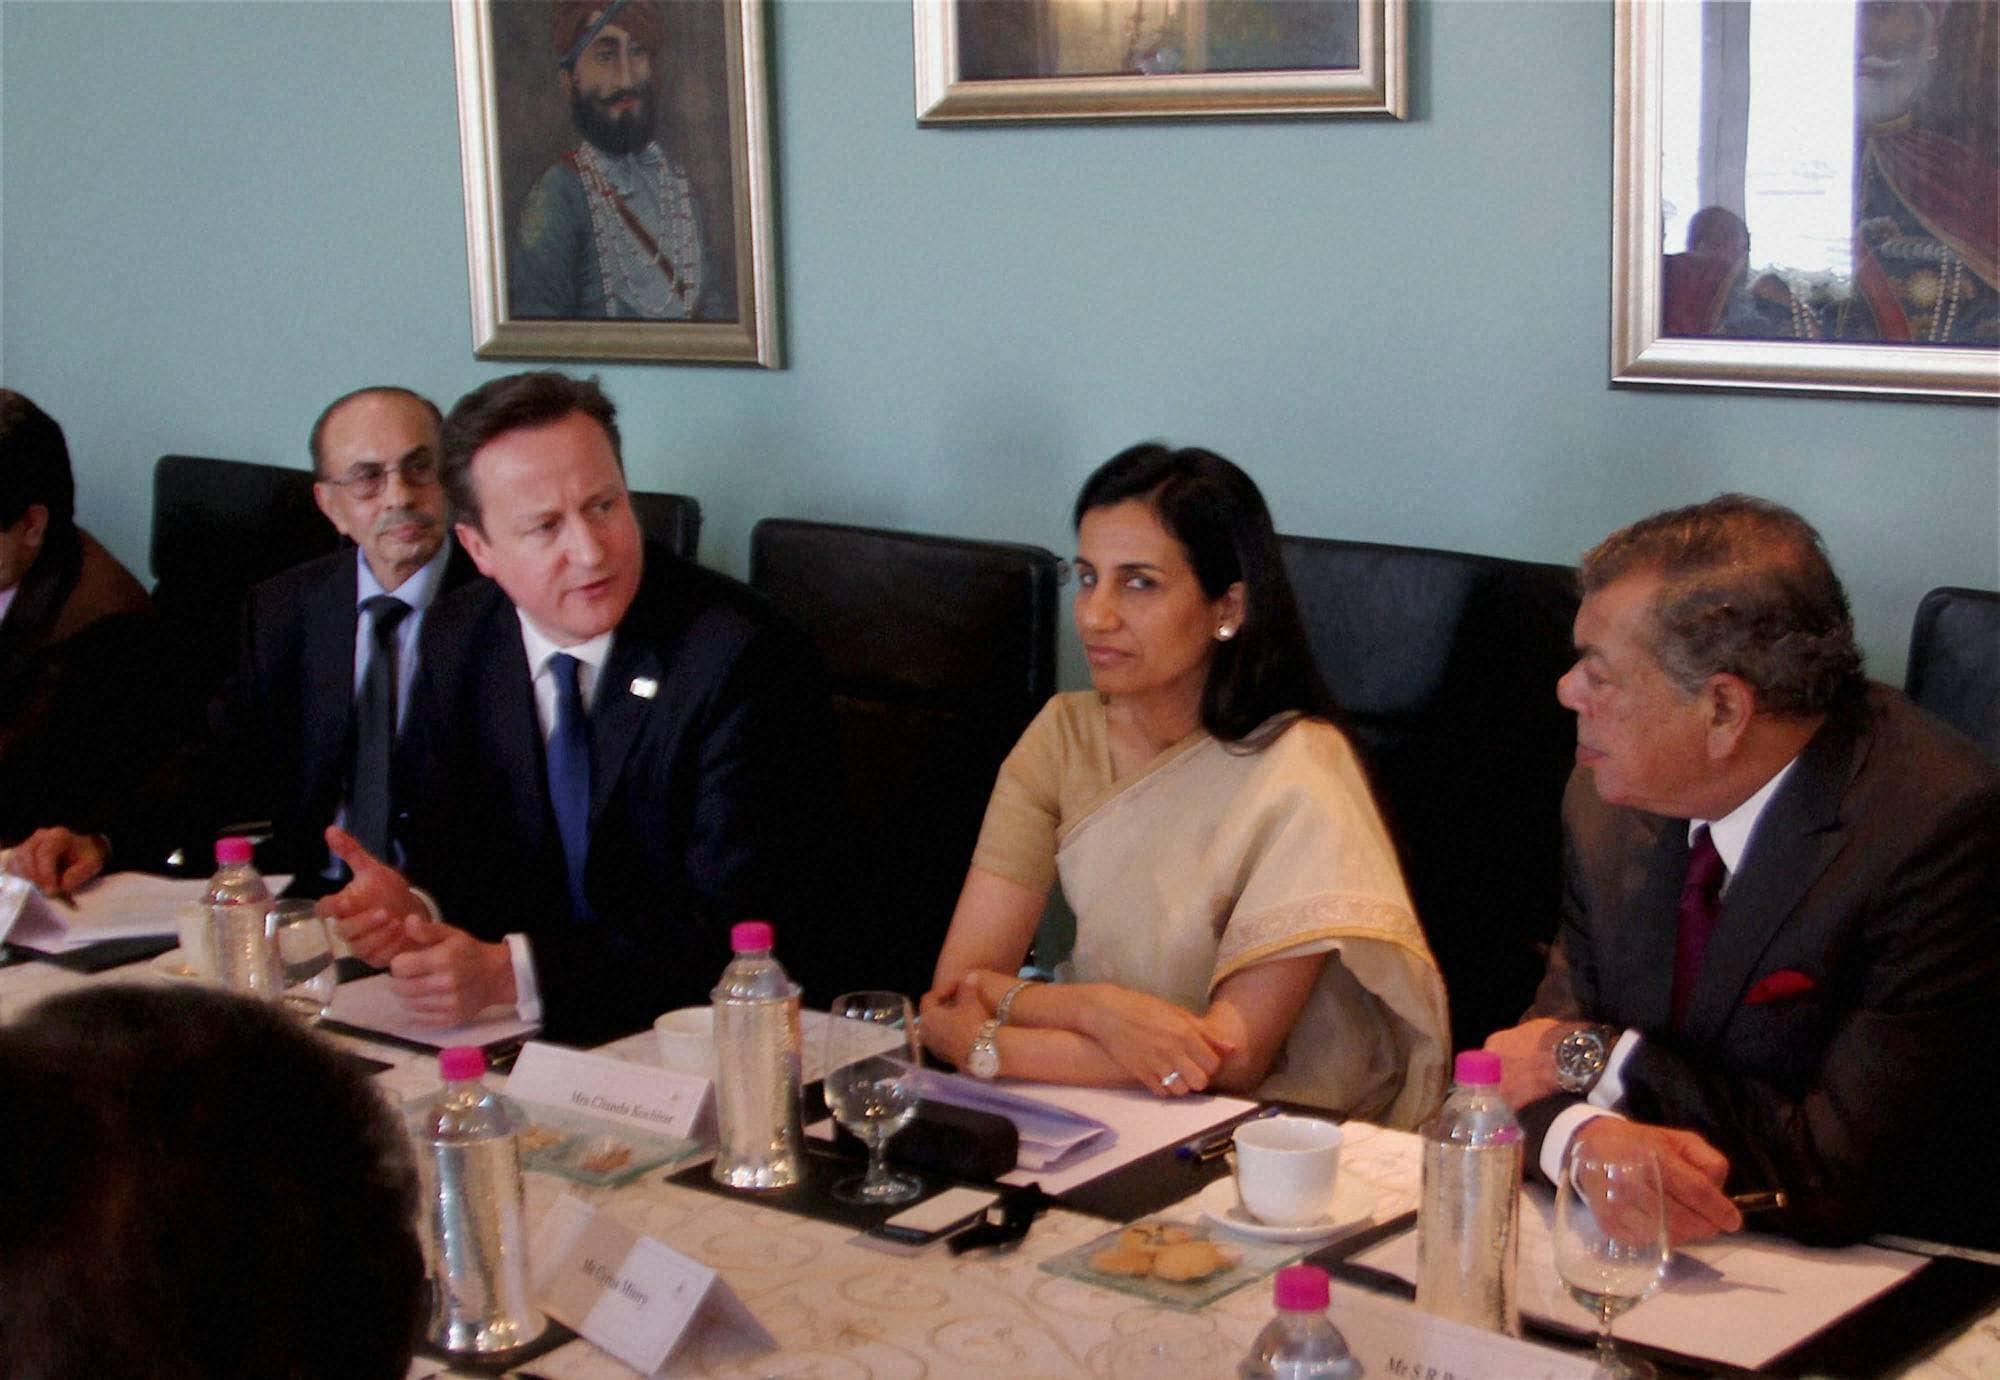 British Prime Minister, David Cameron, Chanda Kocchar, ICICI, Cyrus Mistry, Tata Group